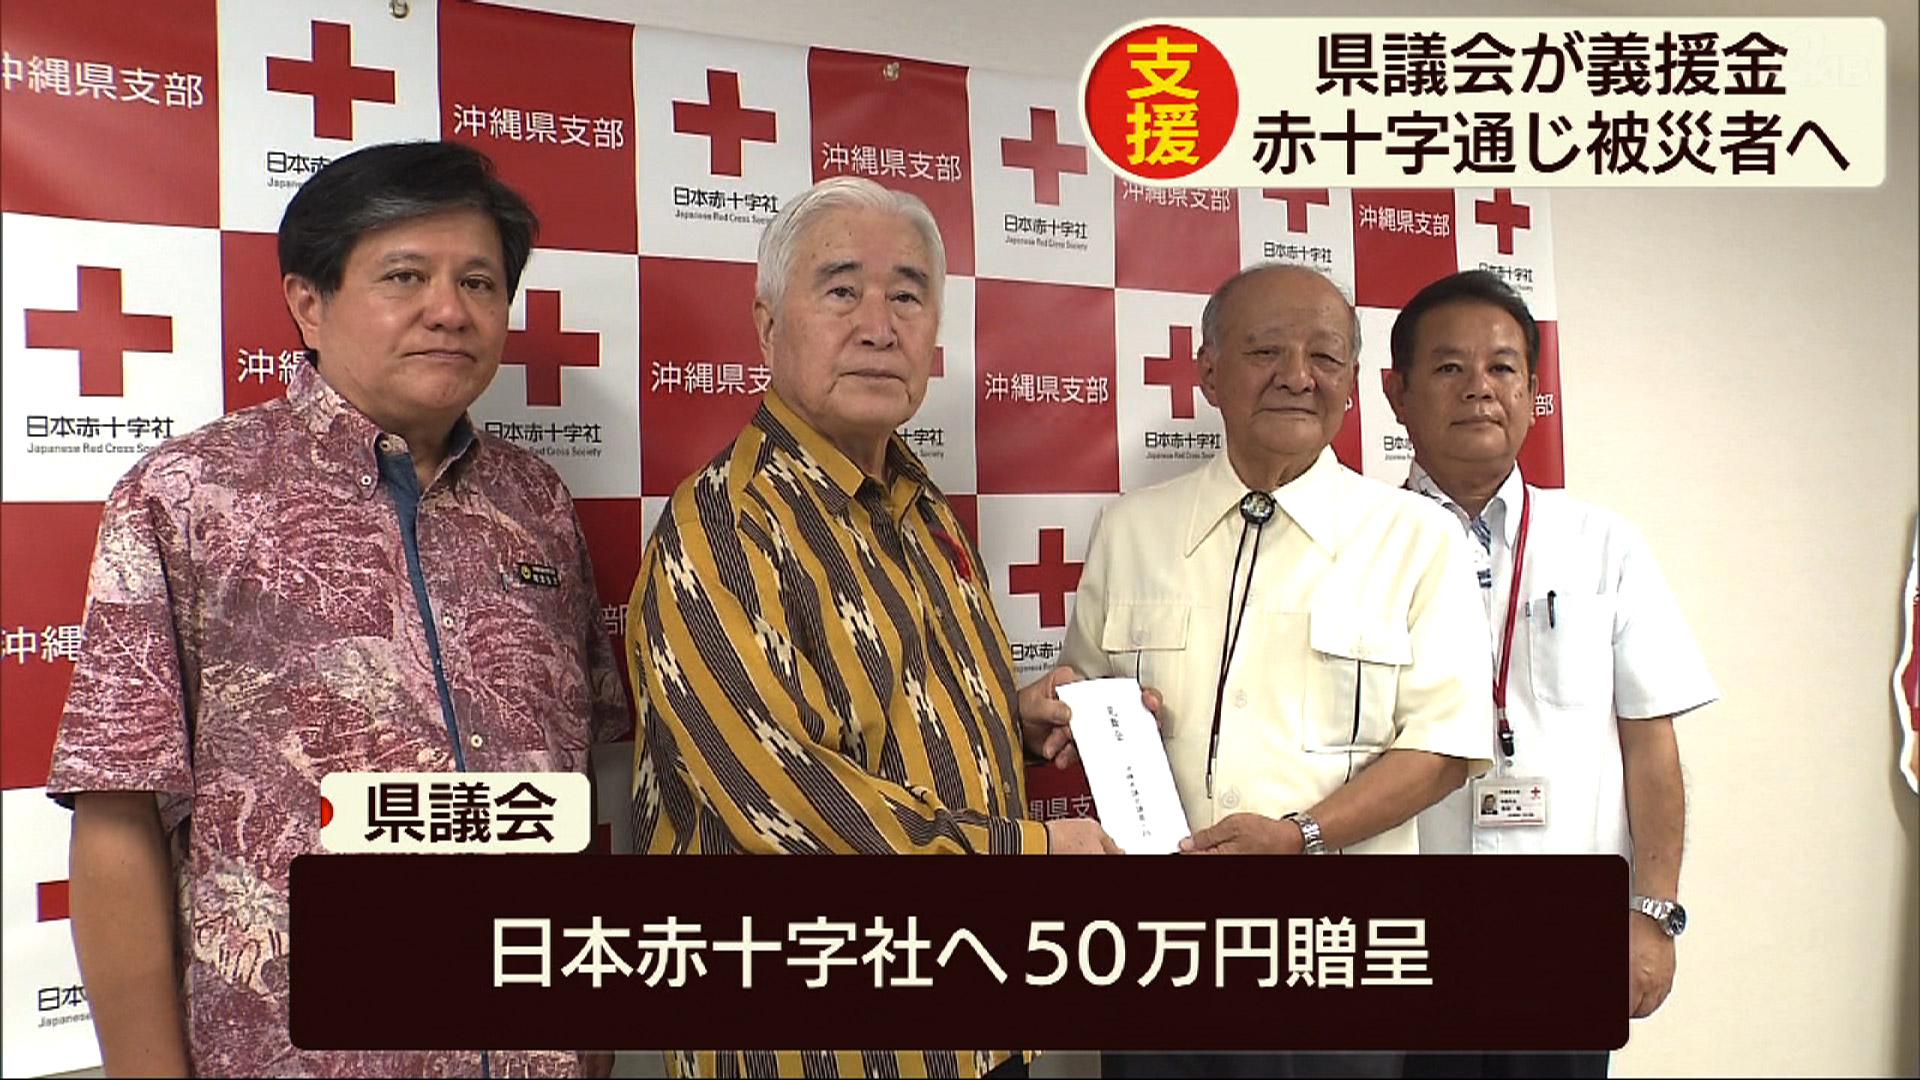 台風19号で県議会が義援金贈呈